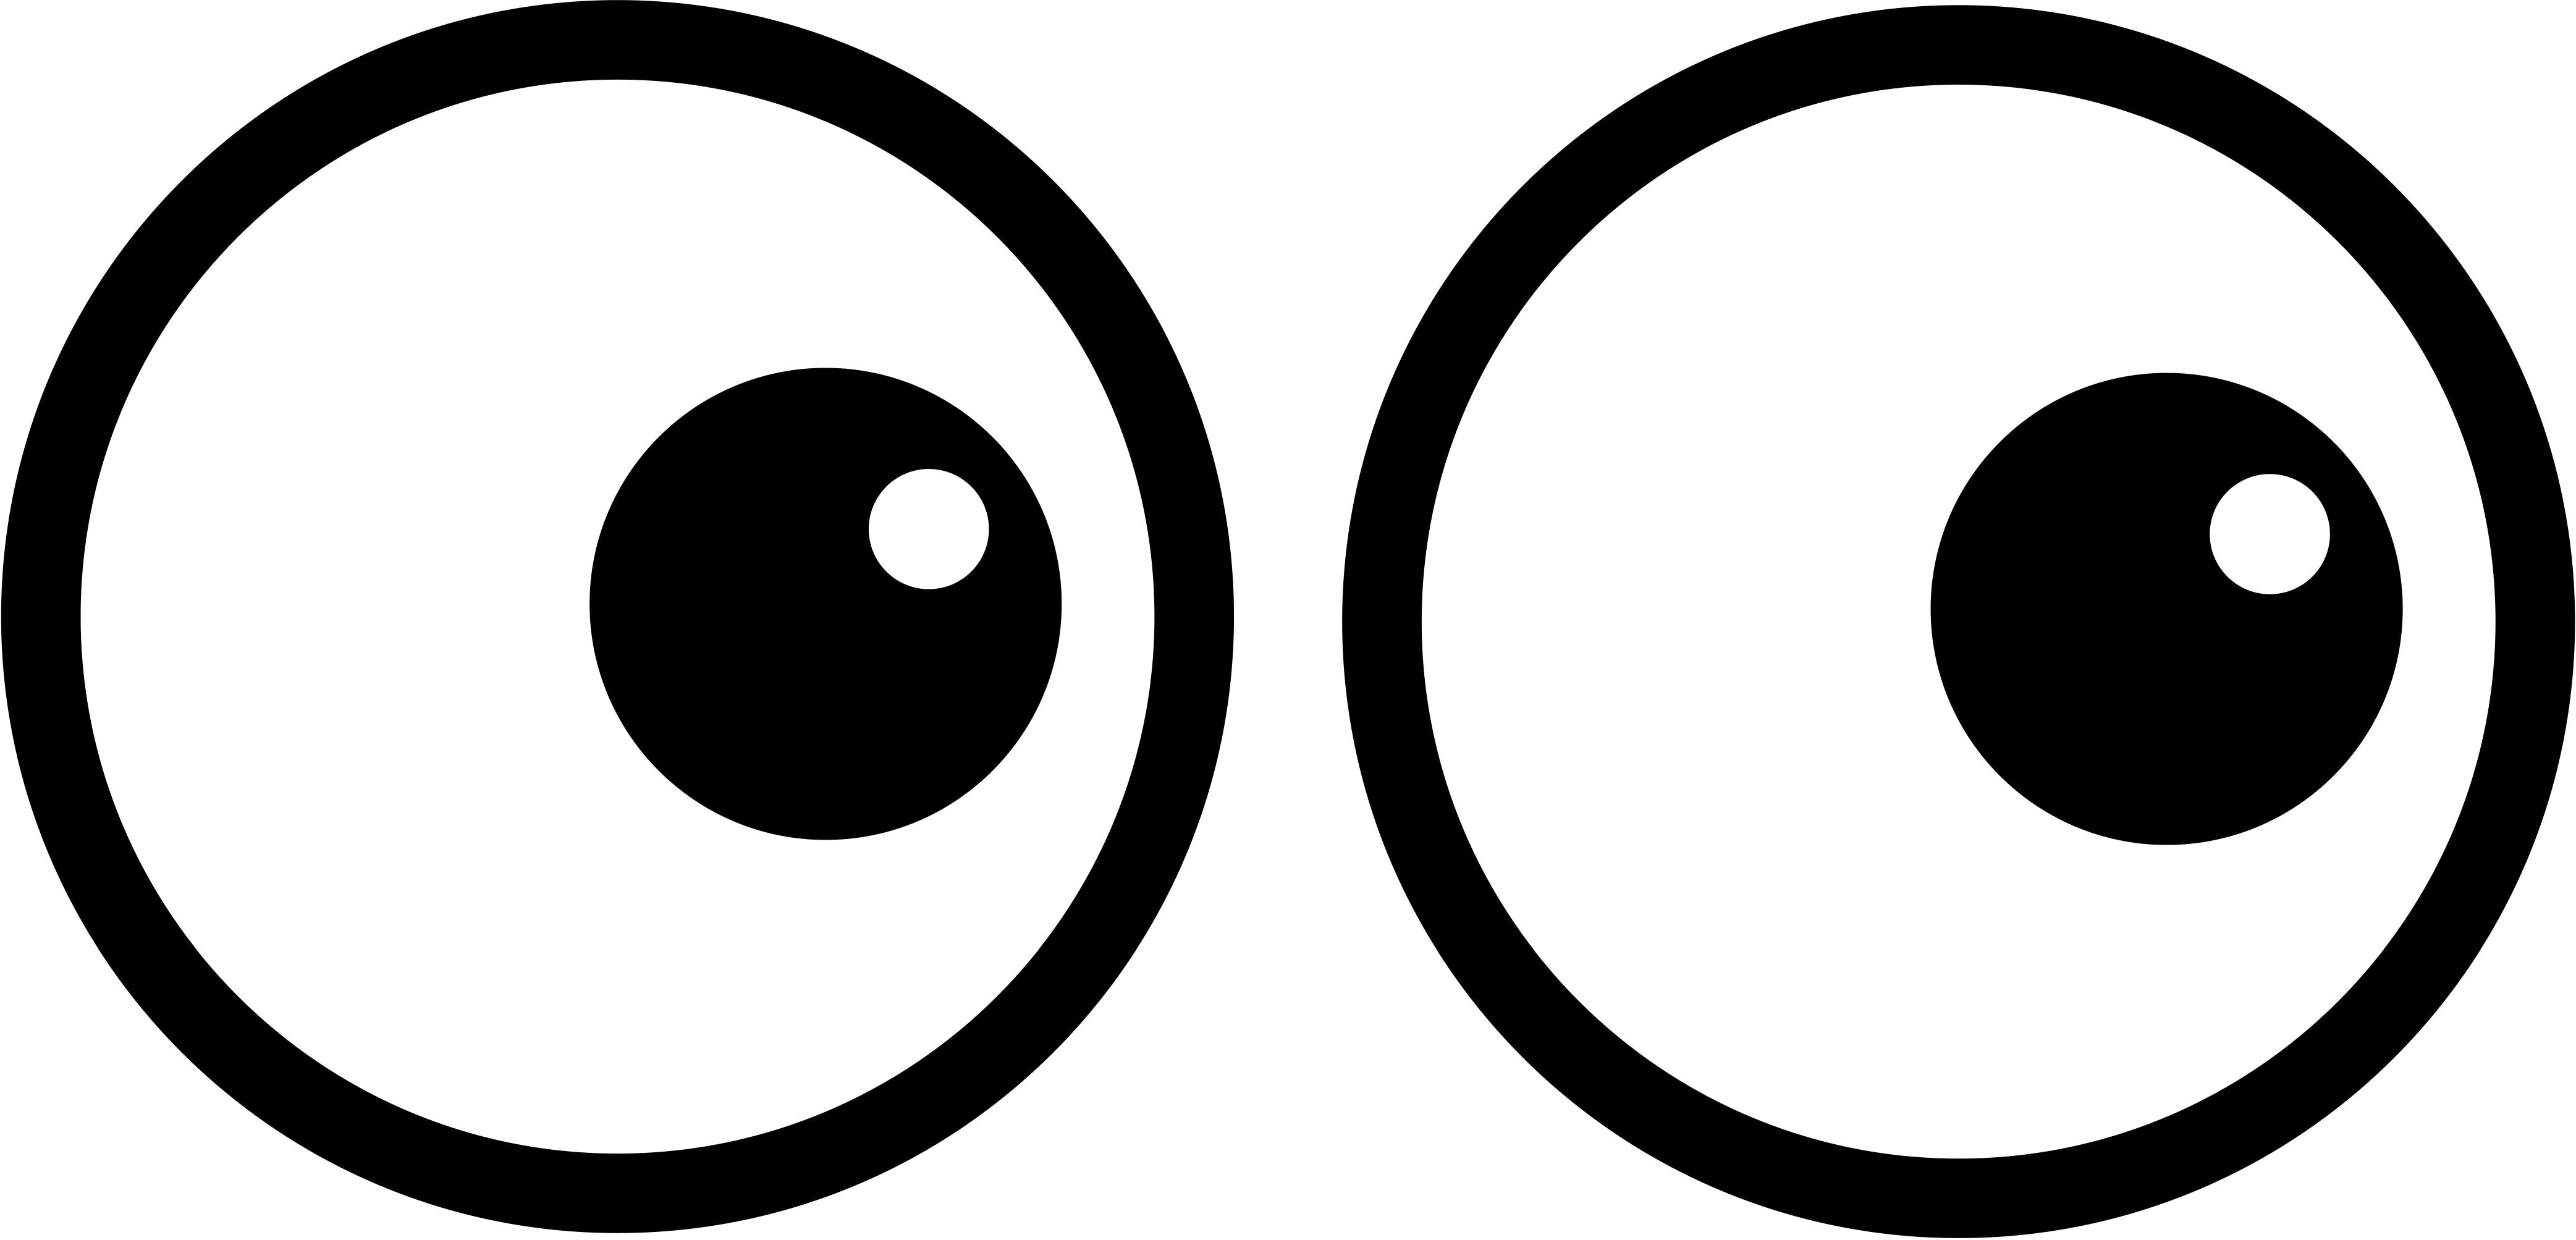 Eye cliparts royalty free stock Eyes eyeball eye clip art clipart cliparts for you image - Clipartix royalty free stock